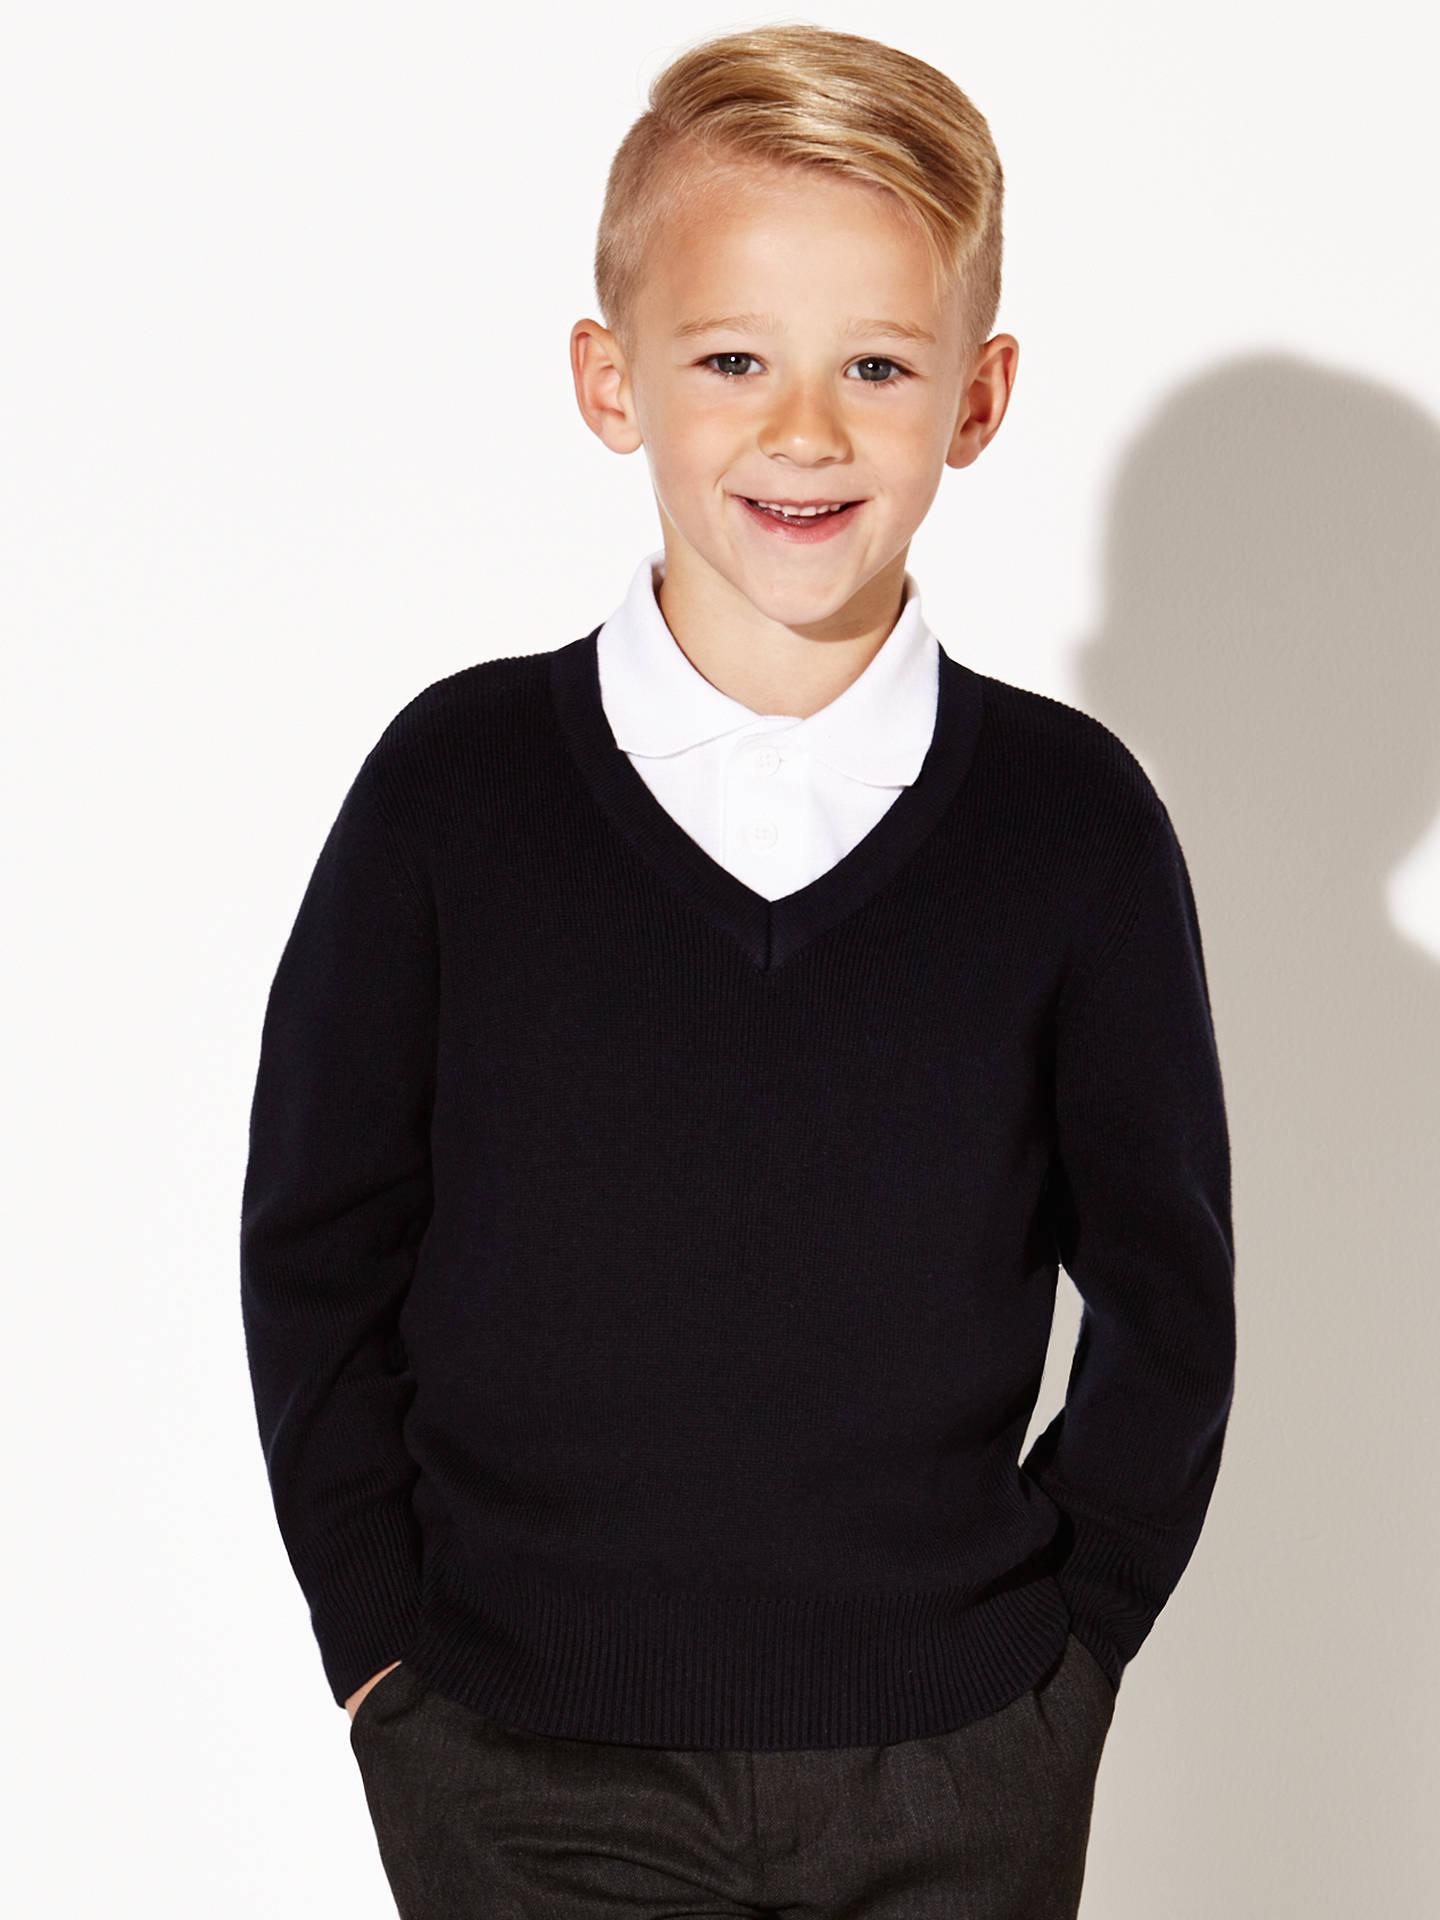 f2736b6d0 Buy John Lewis & Partners Unisex 100% Pure Cotton V-Neck School Jumper, ...